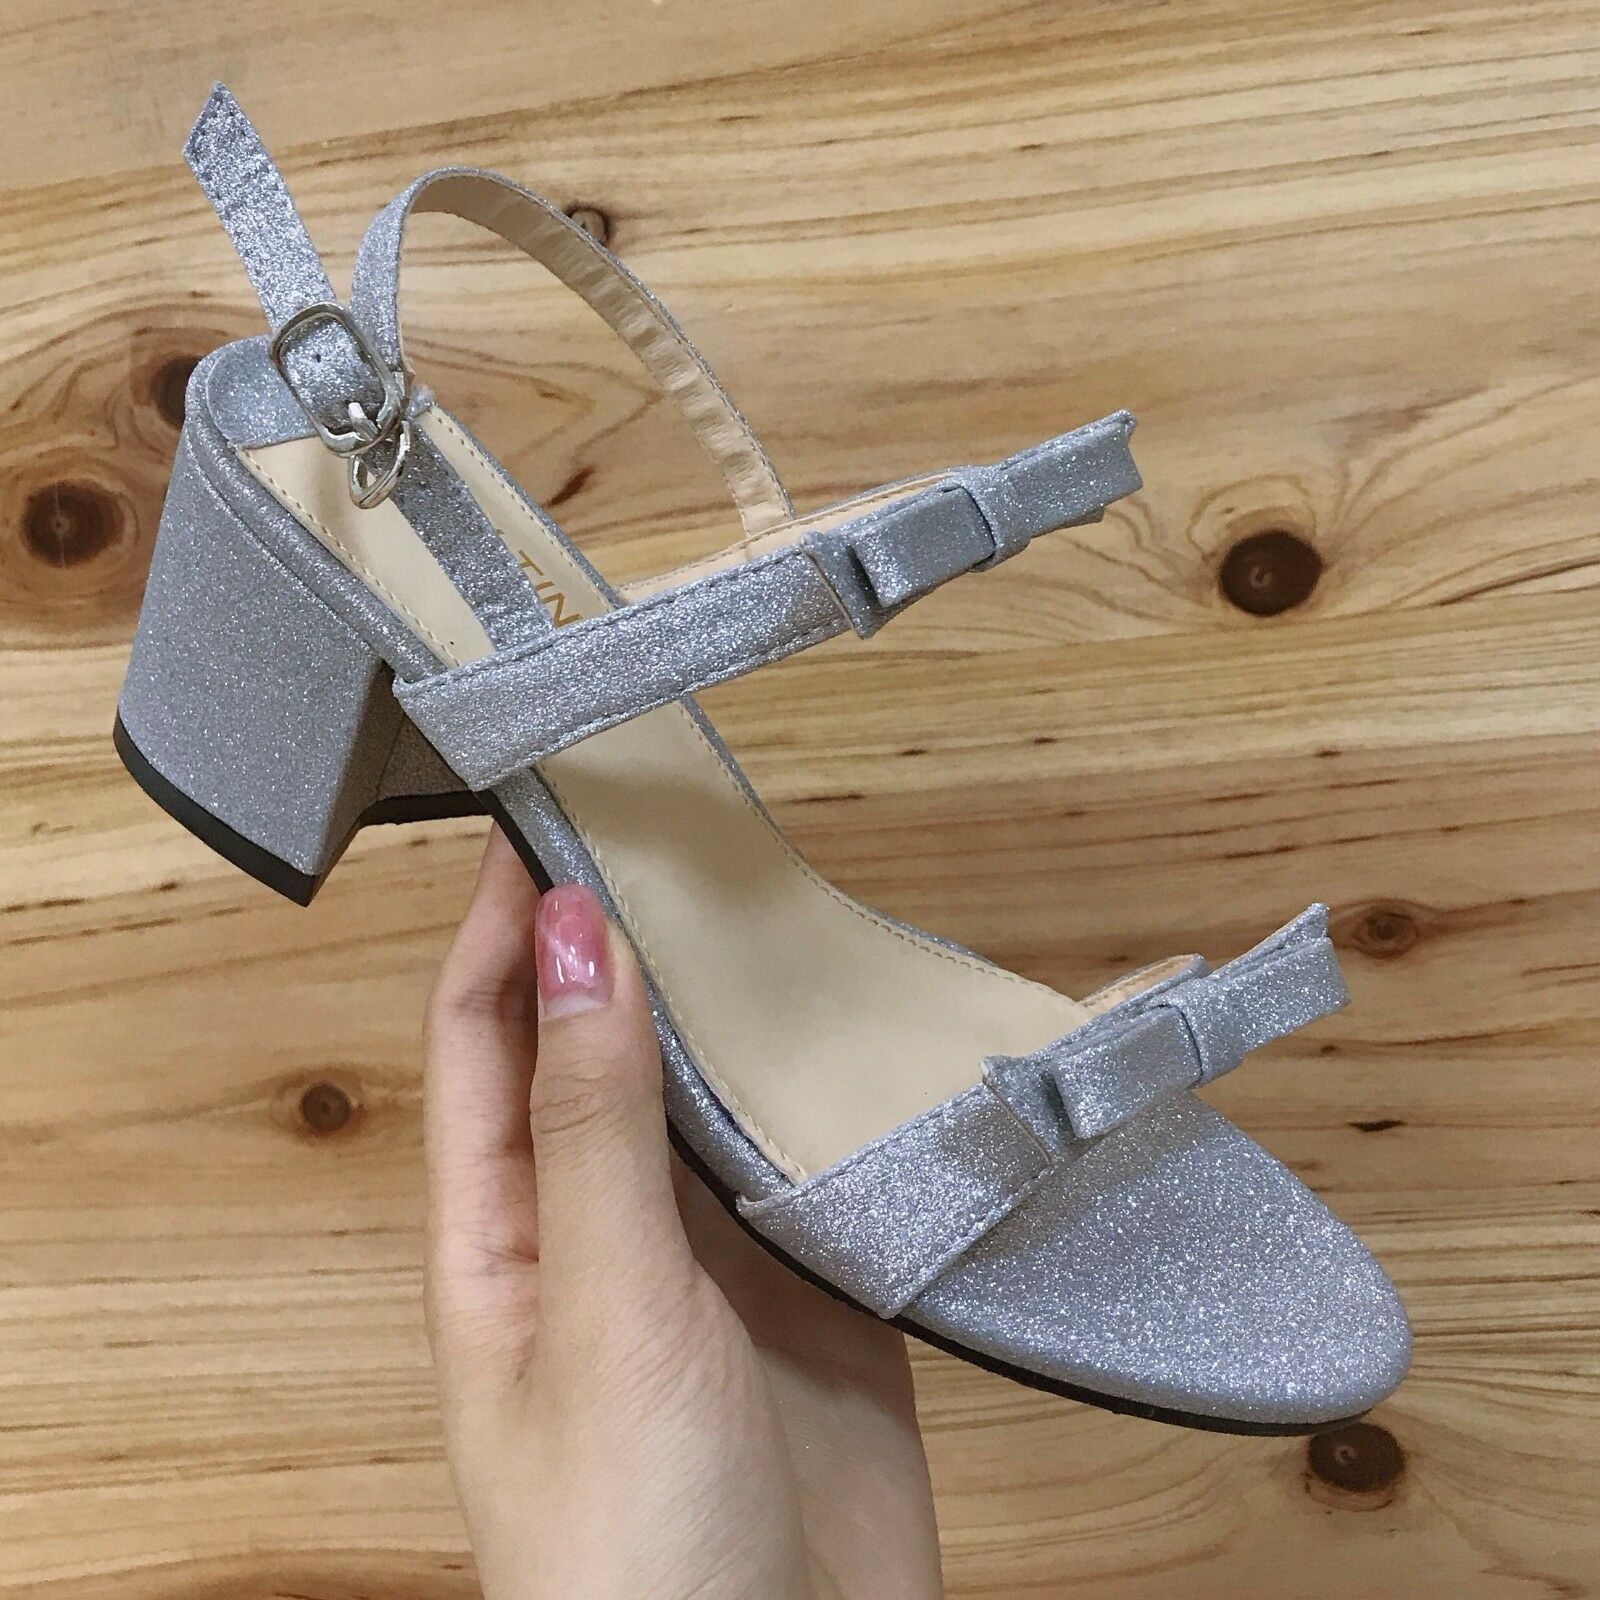 Sandali 7 cm eleganti gris brillantini tacco quadrato pelle sintetica 1093